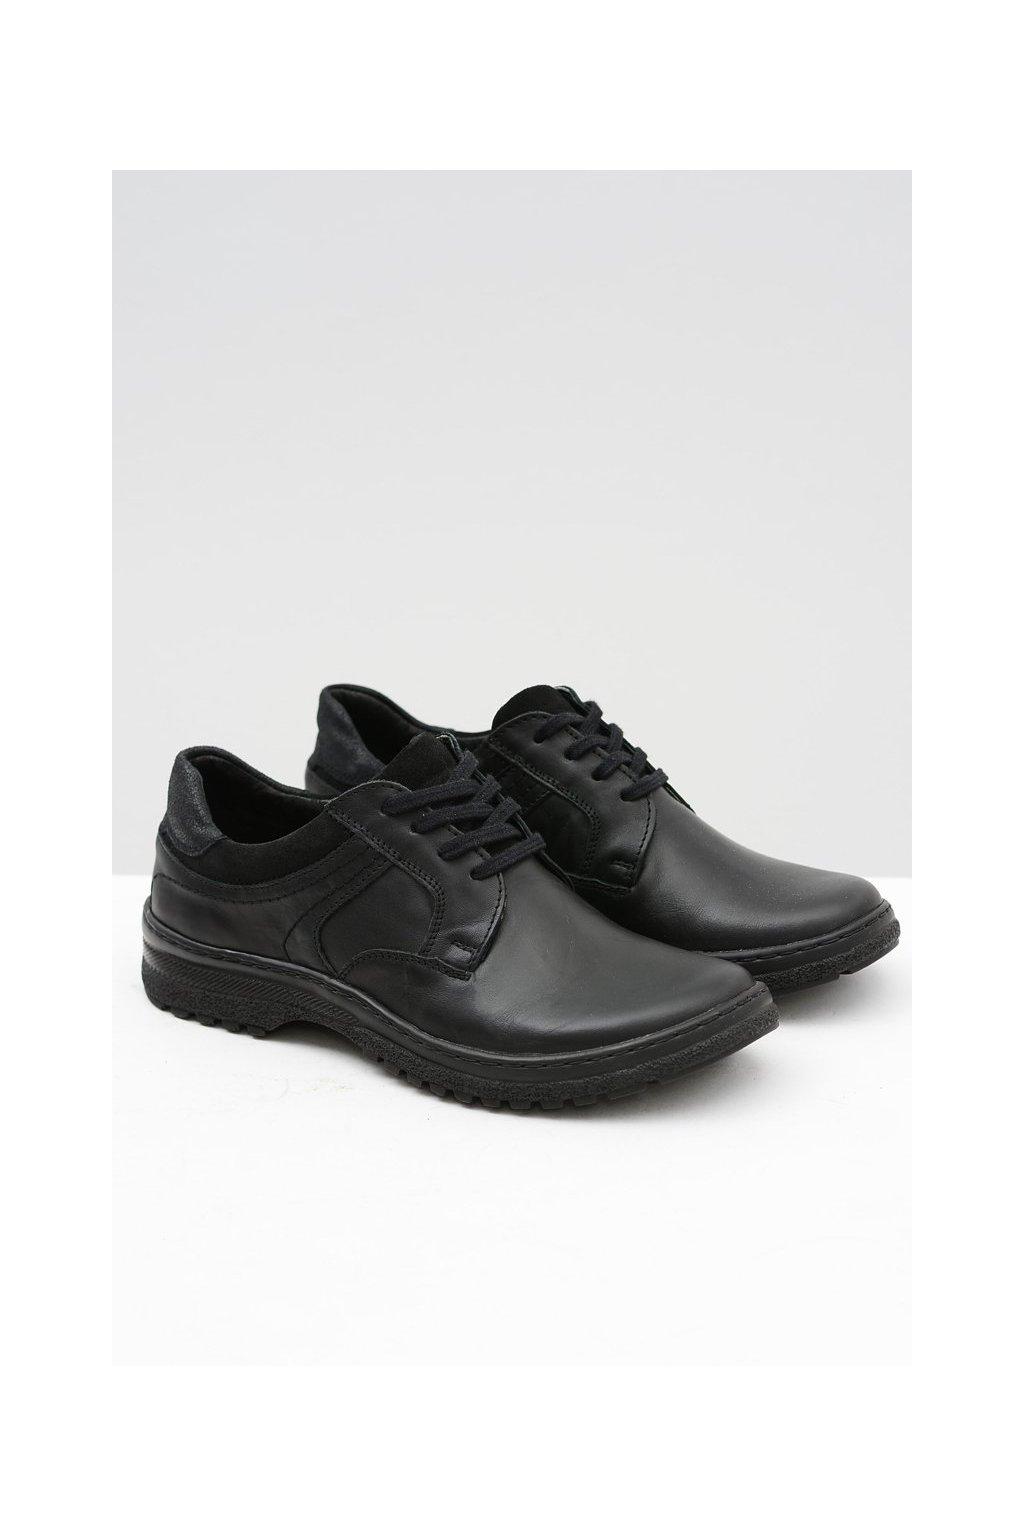 Pánska nízka obuv Ernesto Natural Leather